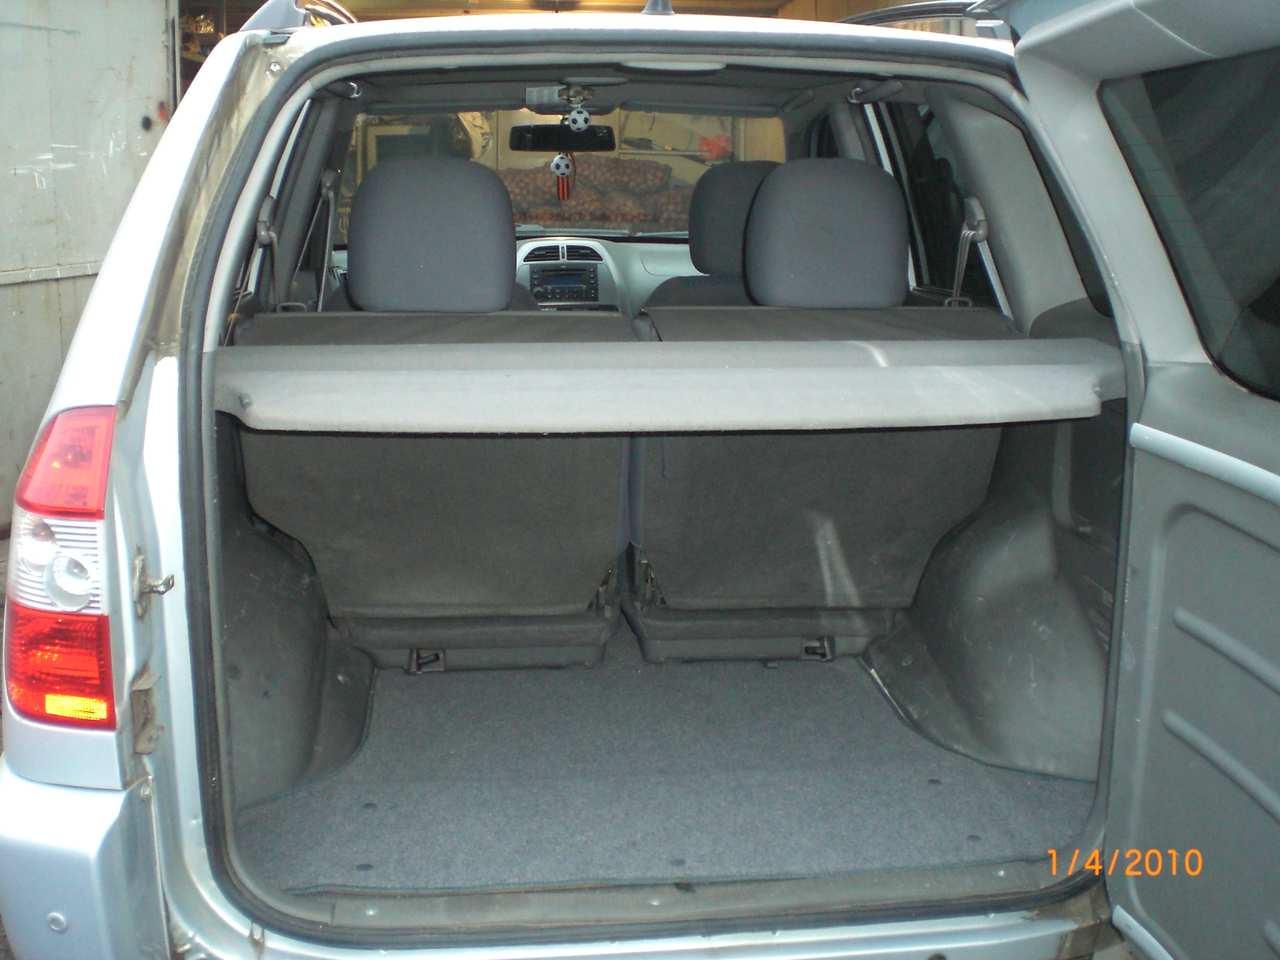 Used 2009 Chery Tiggo Photos, 1800cc , Gasoline, FF, Manual For Sale